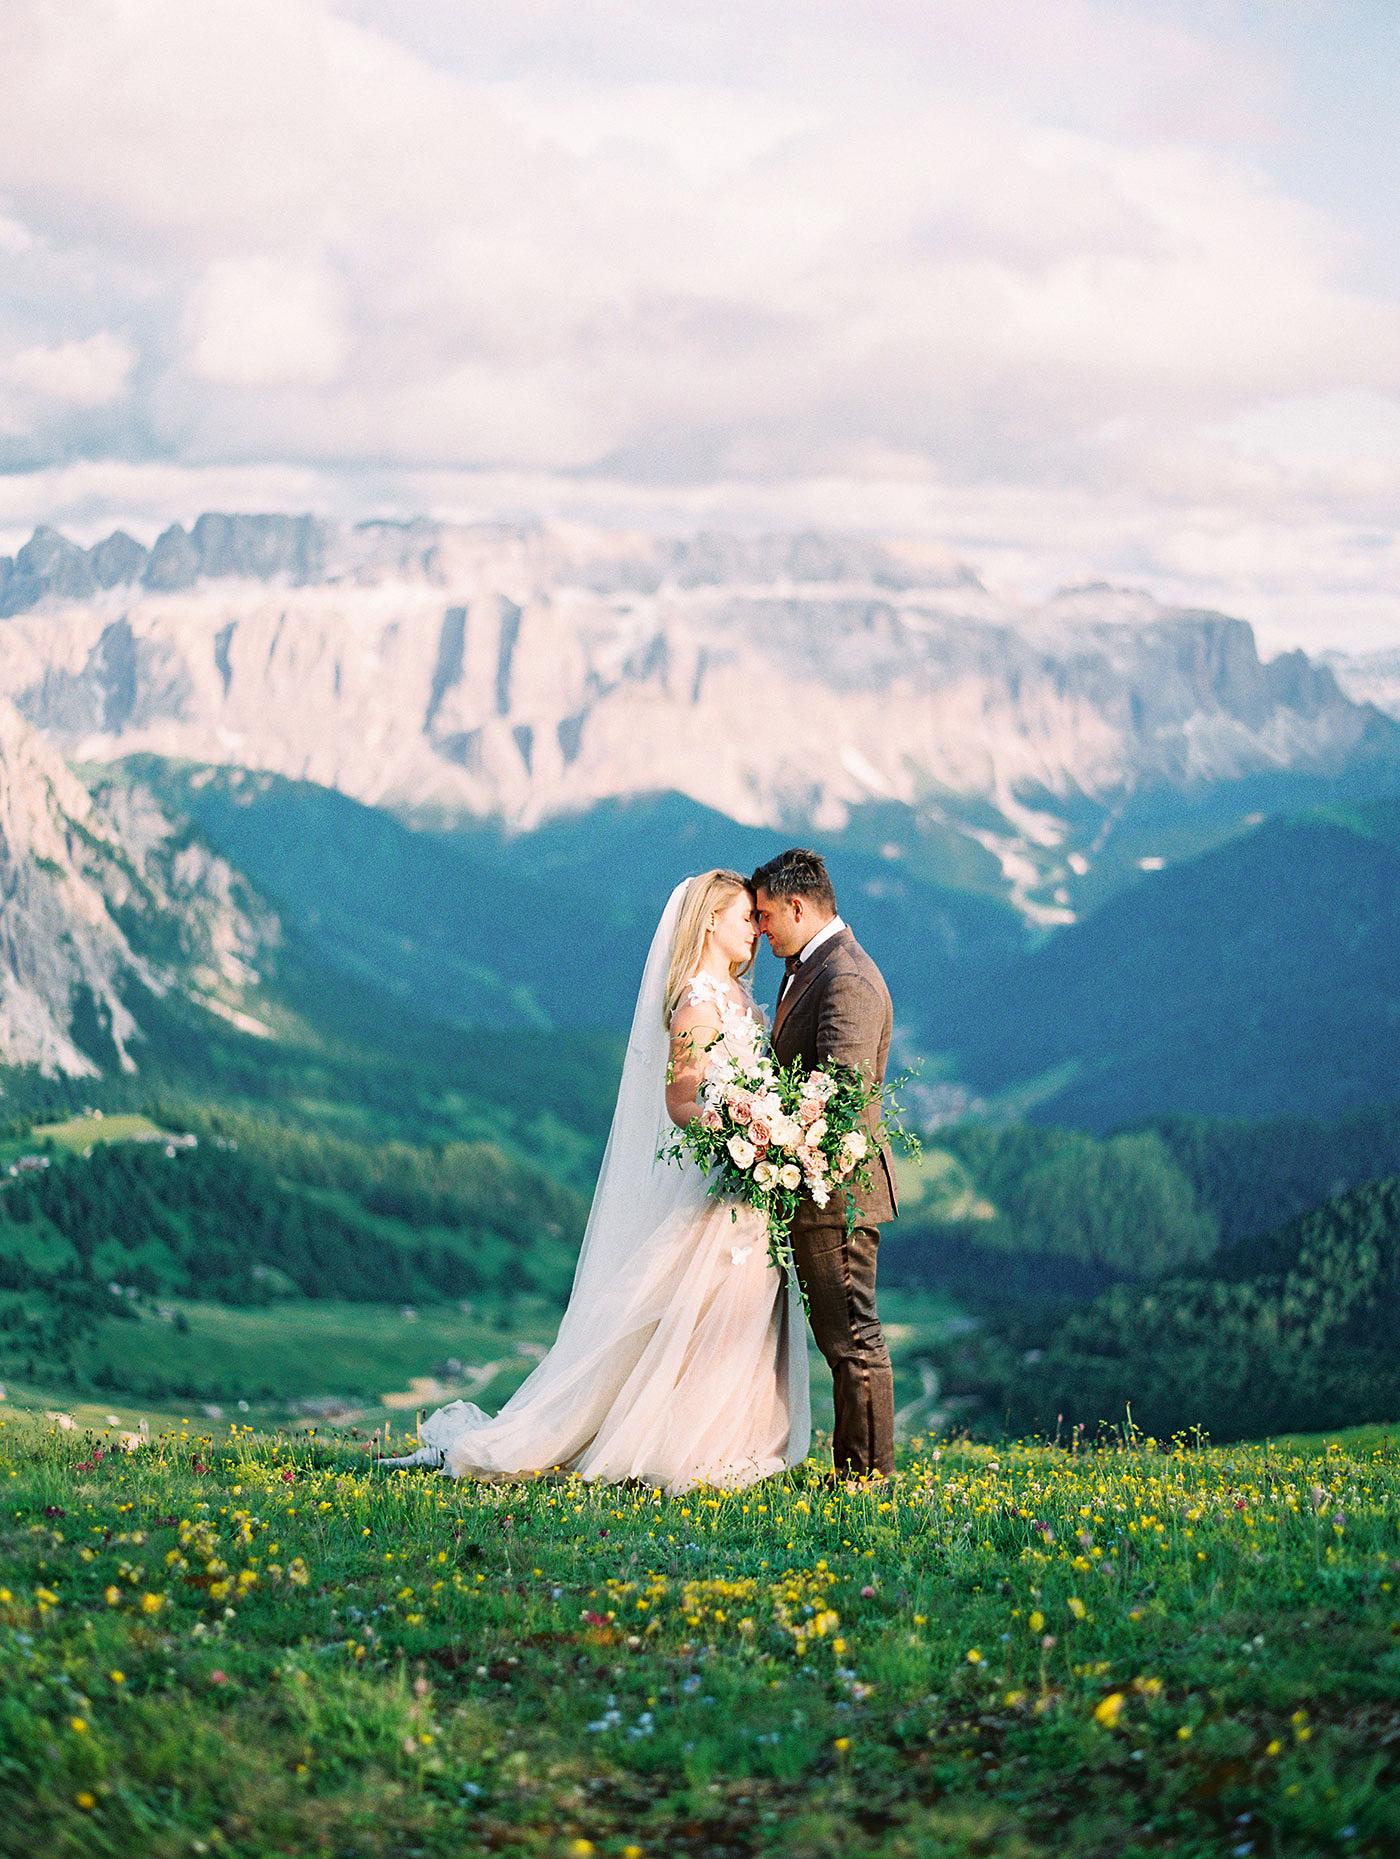 julia franz wedding couple touching foreheads